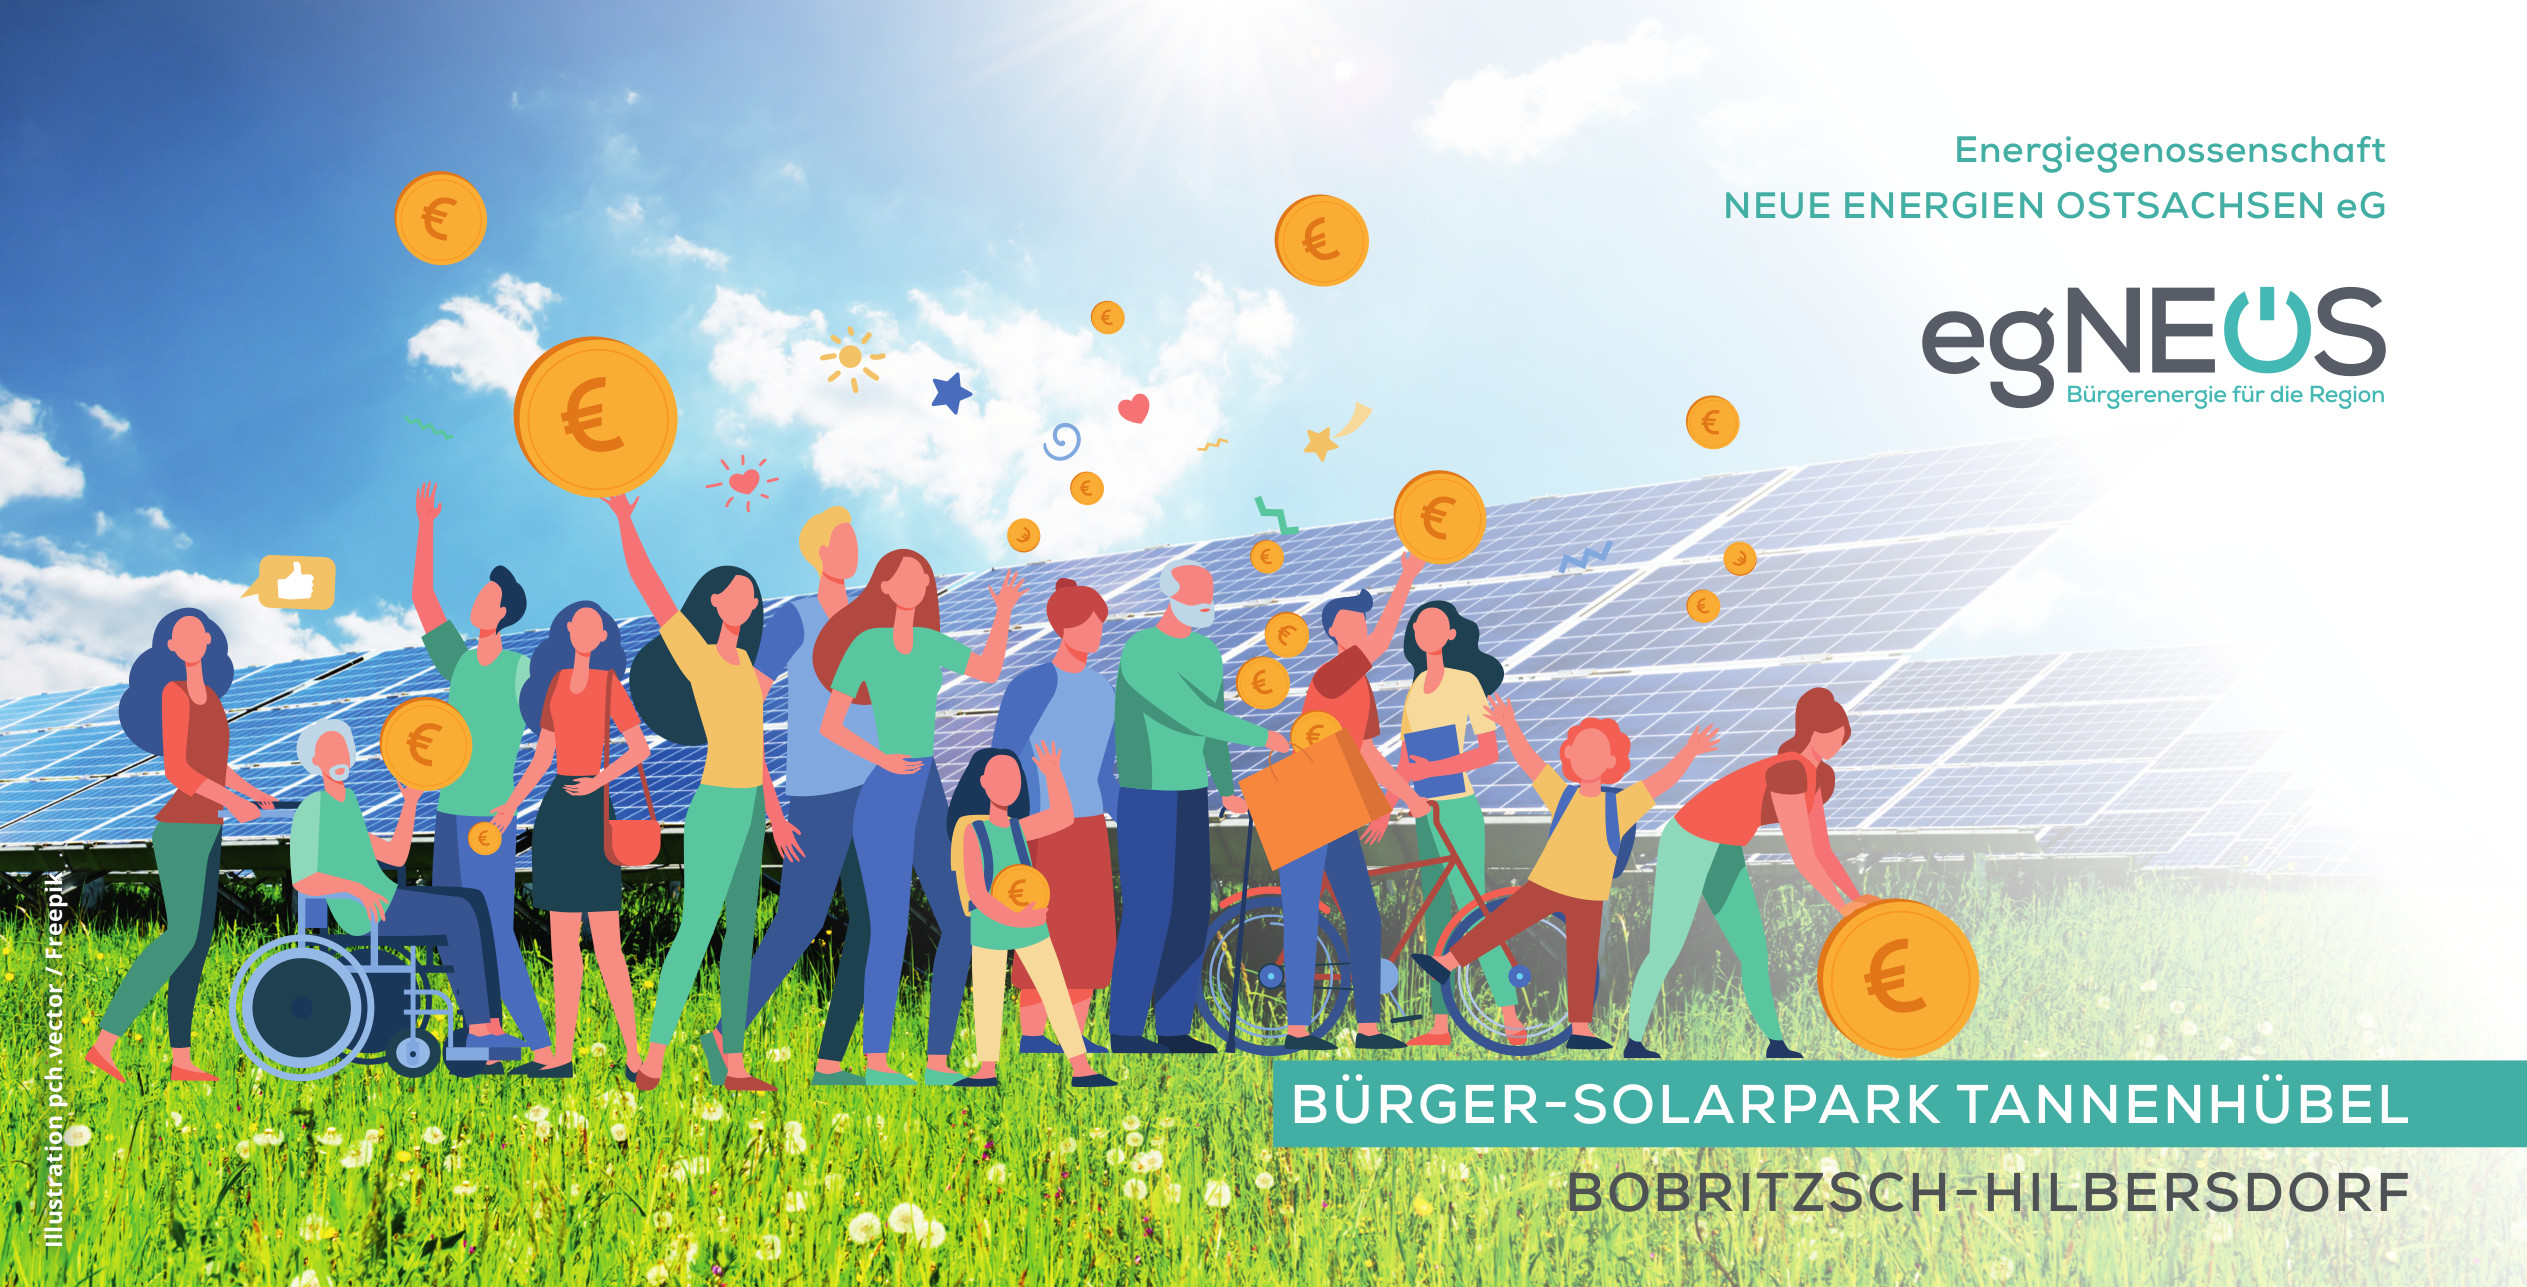 Bürger-Solarpark